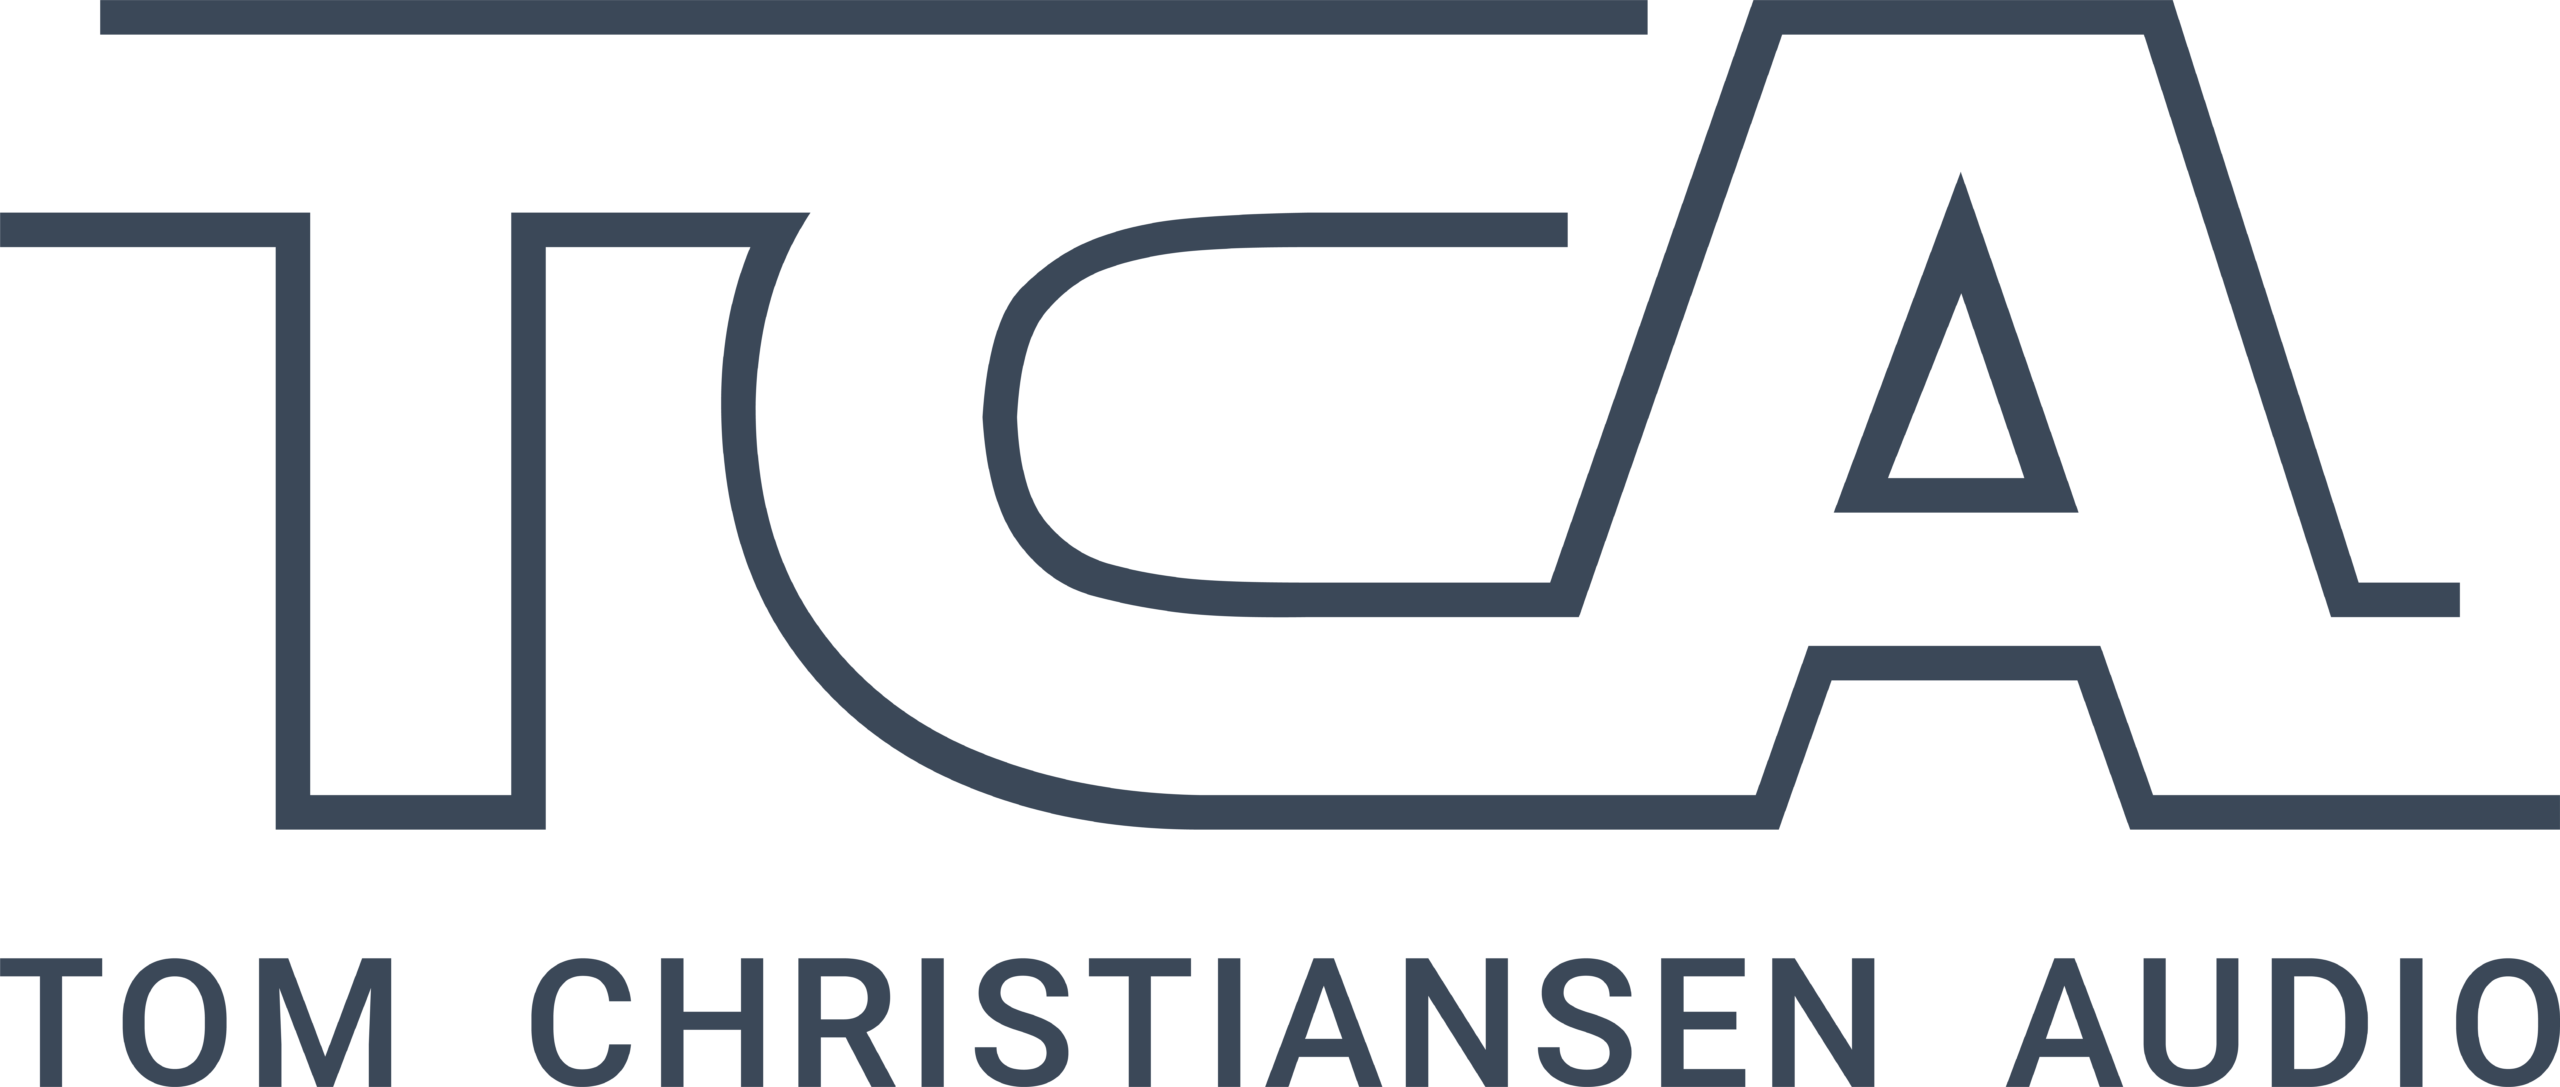 Tom Christiansen Audio